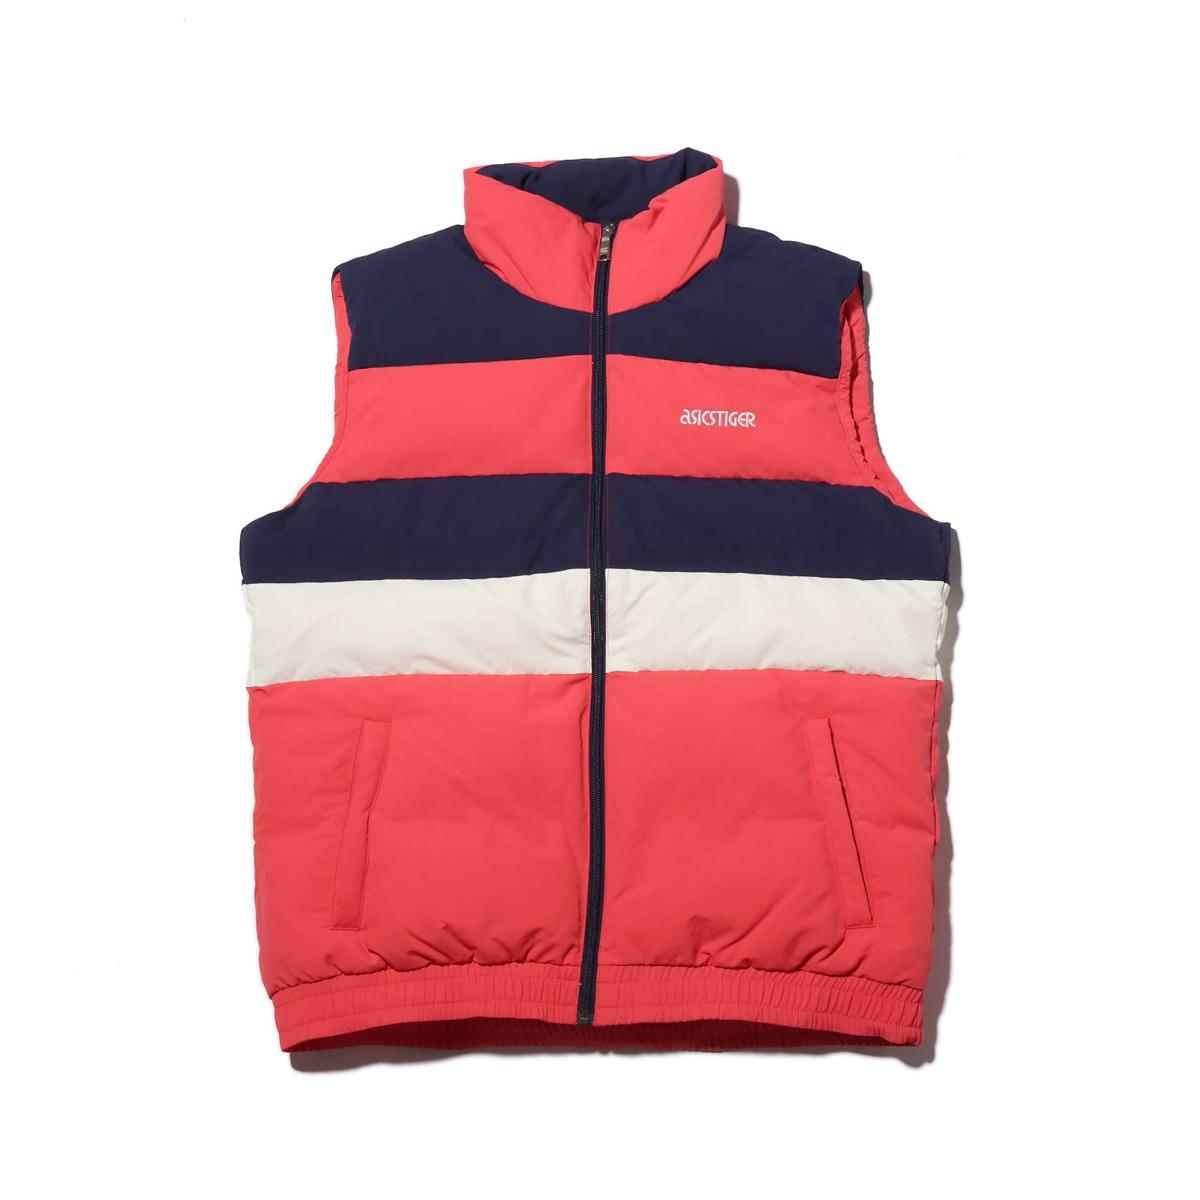 ASICSTIGER CB Down Vest(アシックスタイガー CB ダウン ベスト)RED ALERT【メンズ レディース ベスト】18FW-I